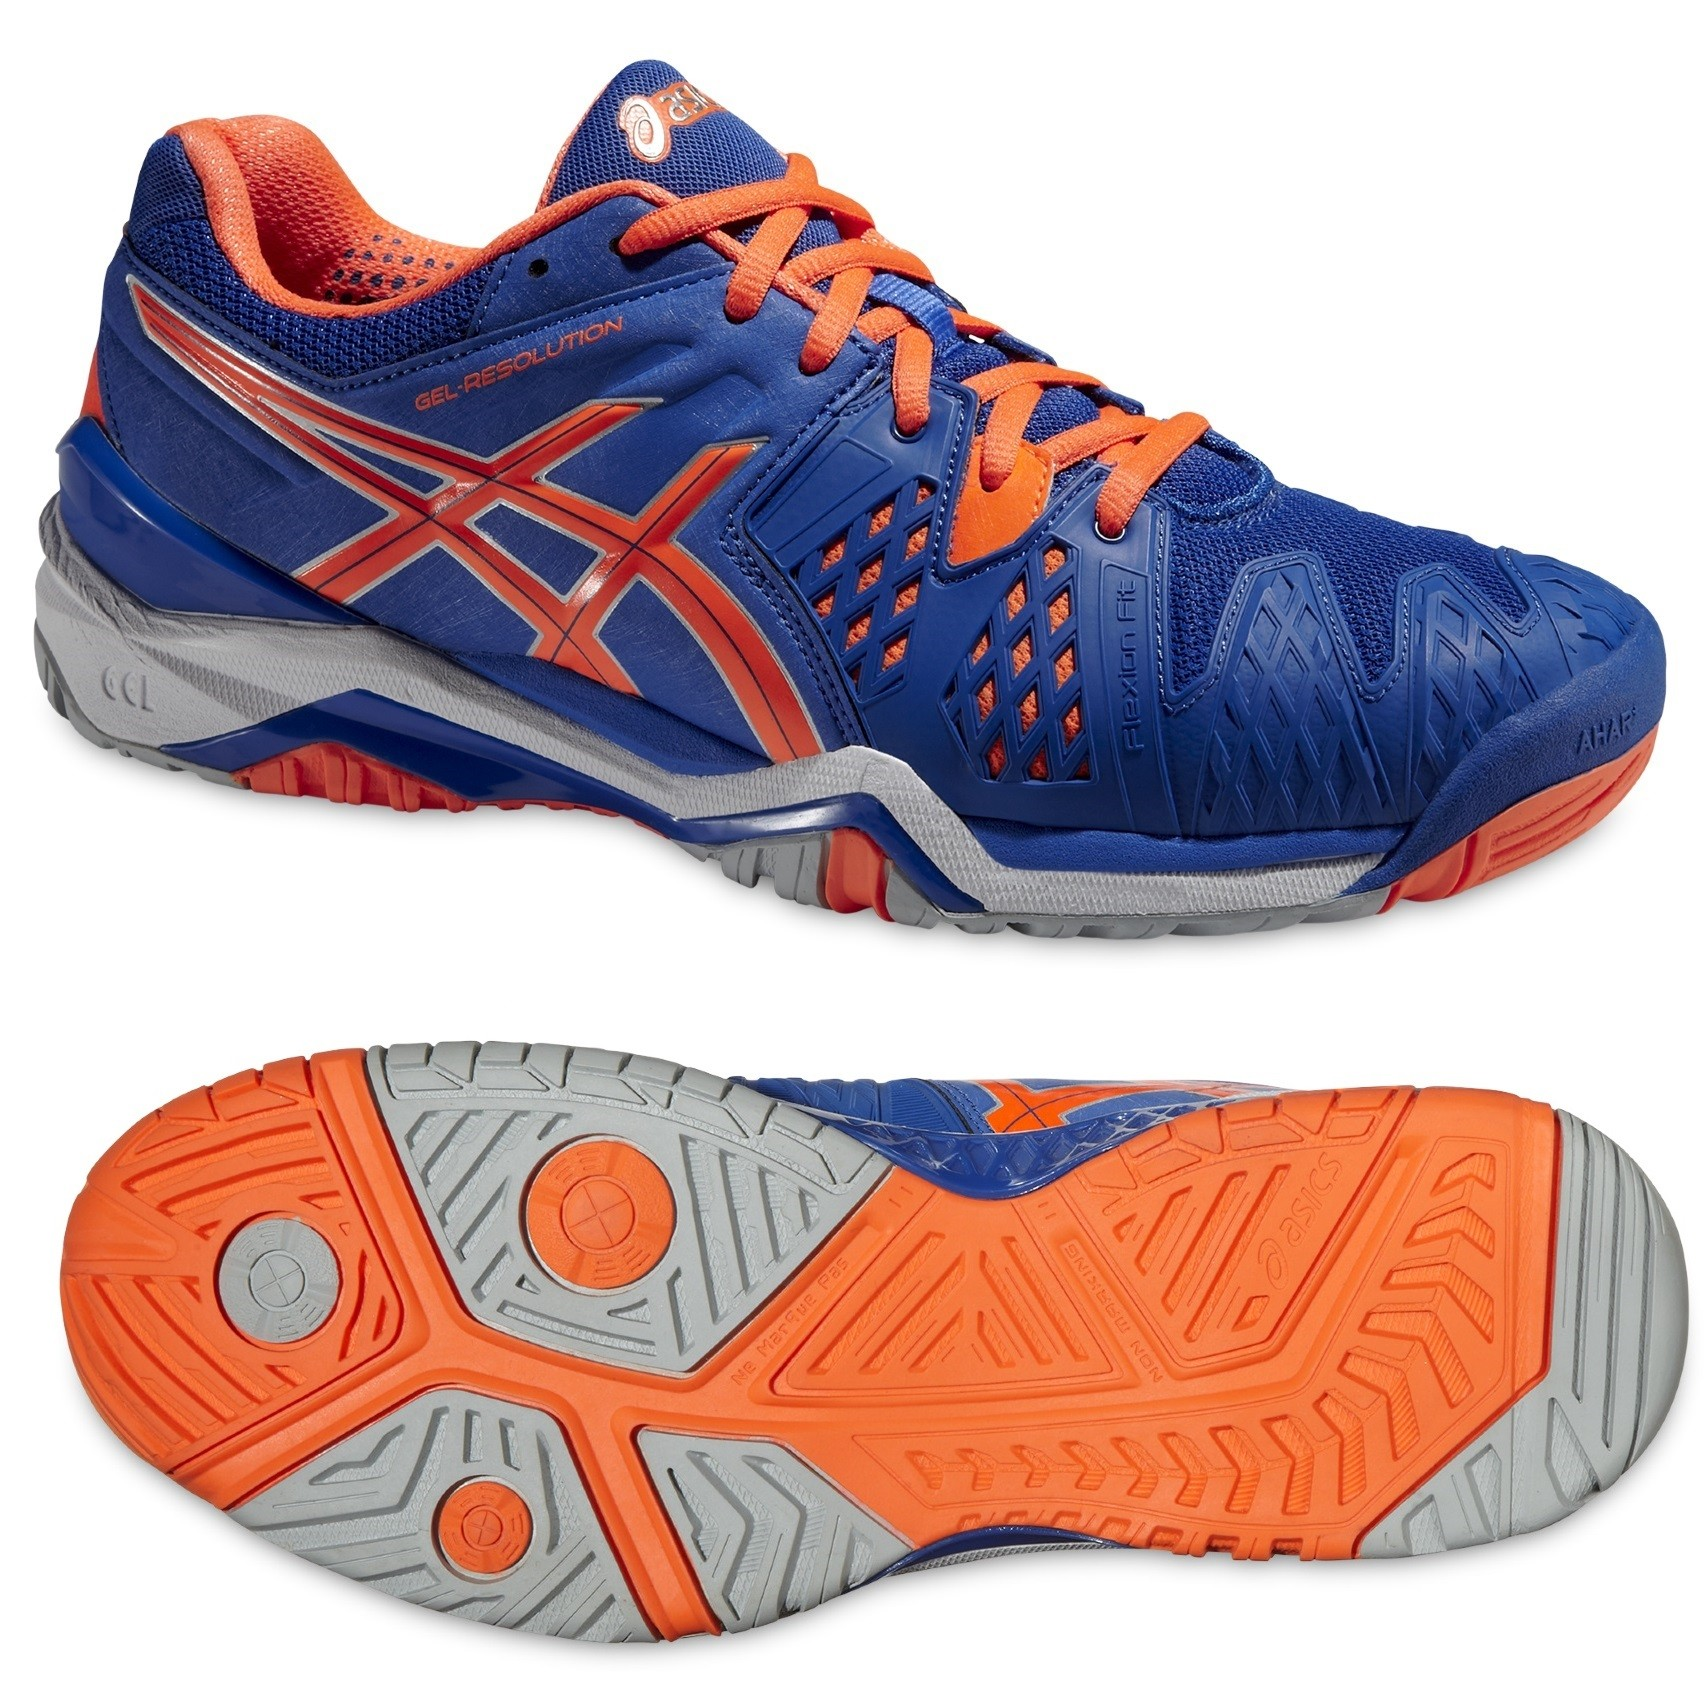 ba736e80657 Tenisová obuv Asics Gel Resolution 6 E500Y-4230 modro-oranžová